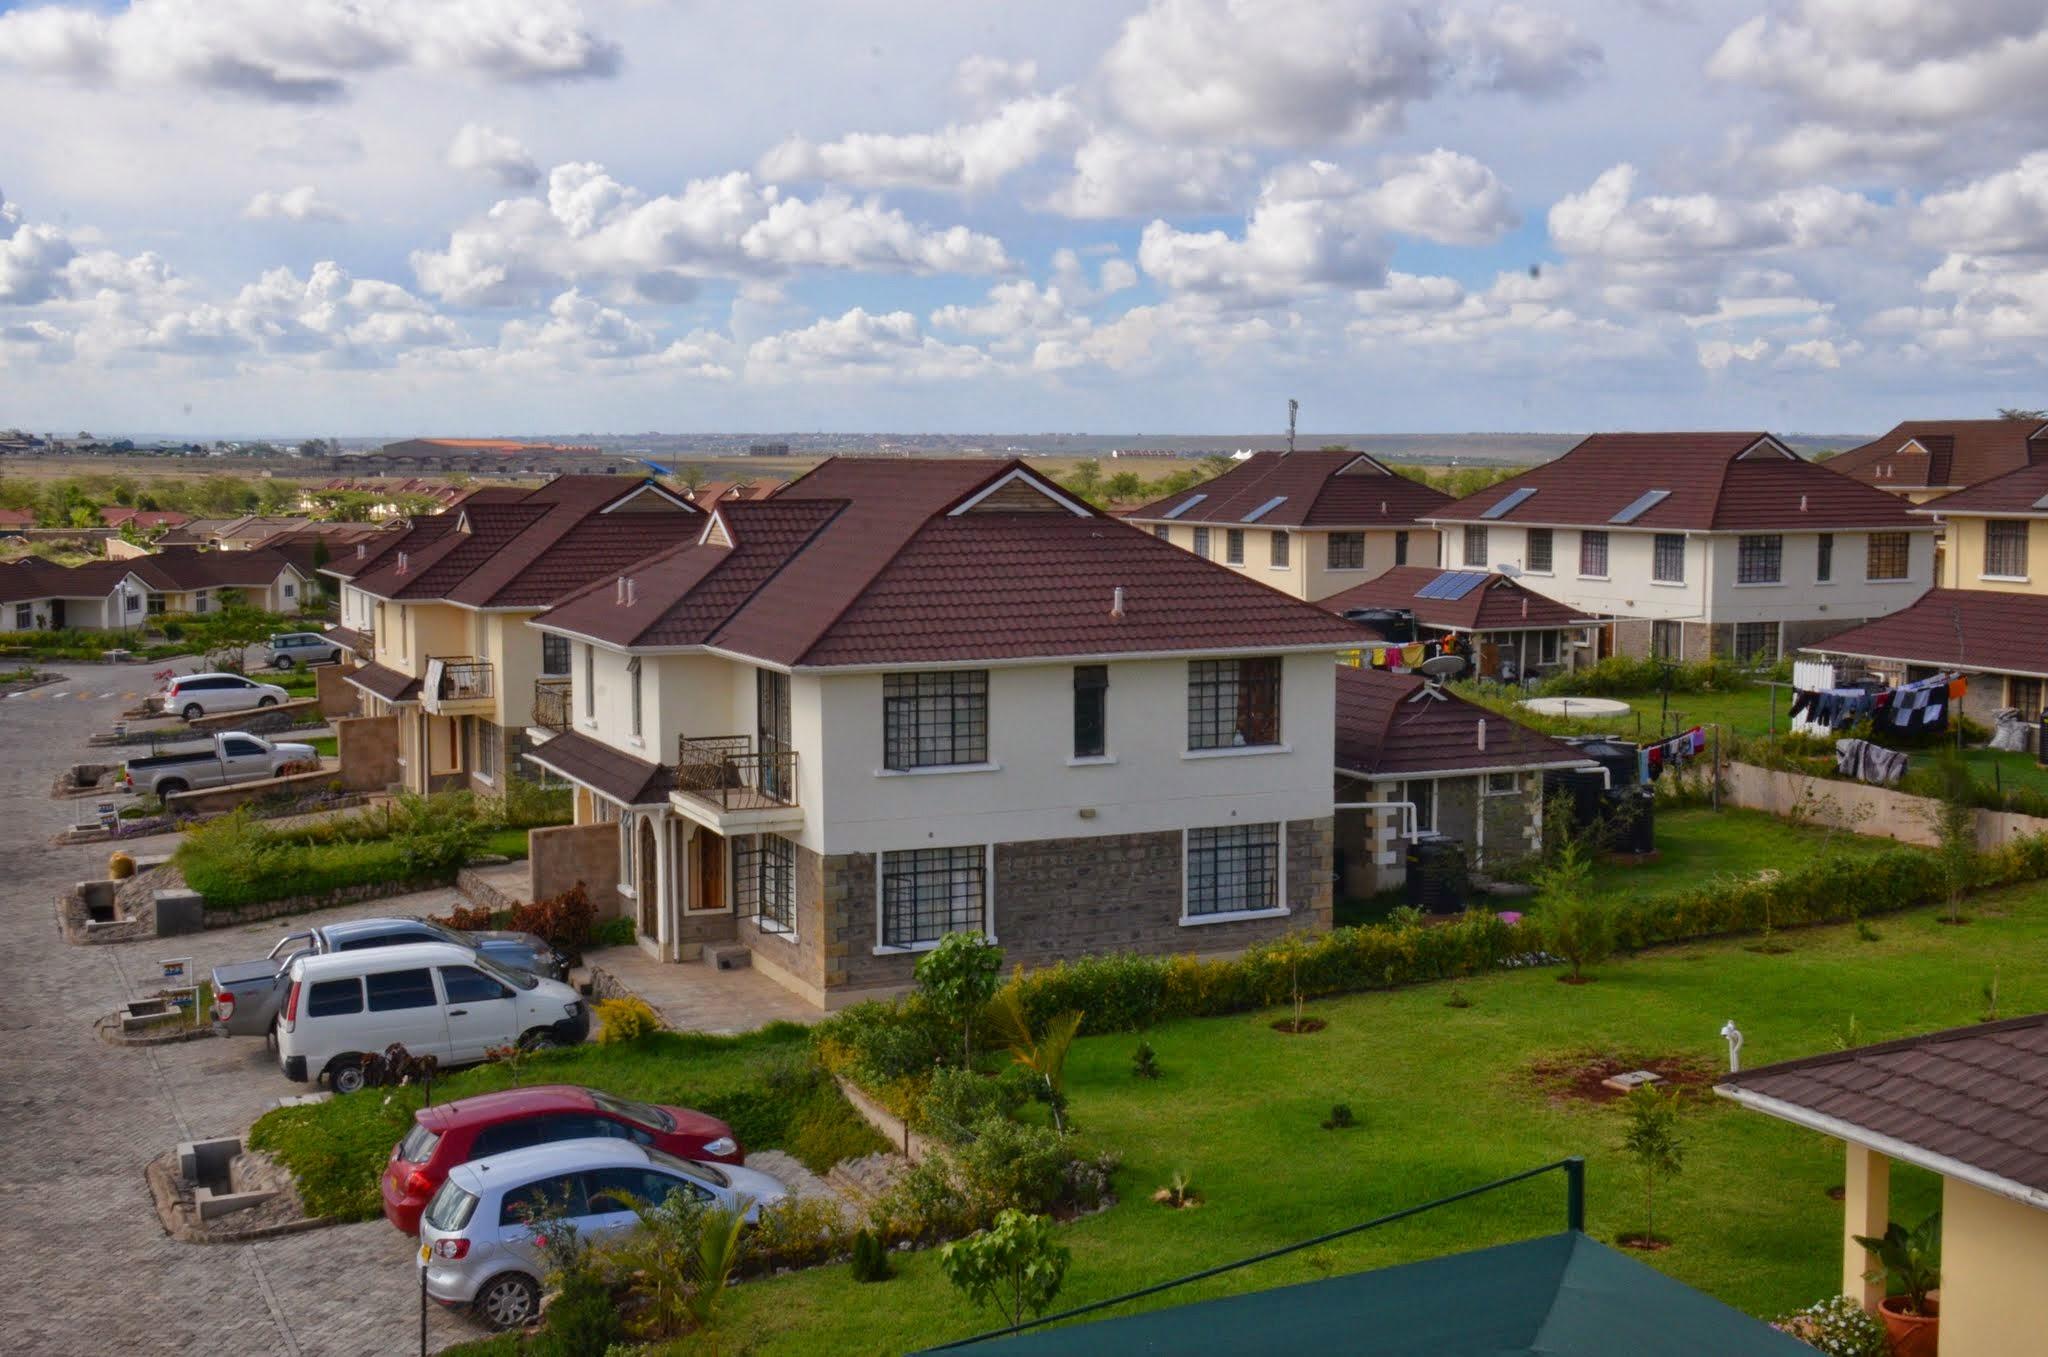 Unmasking the housing deficit trap